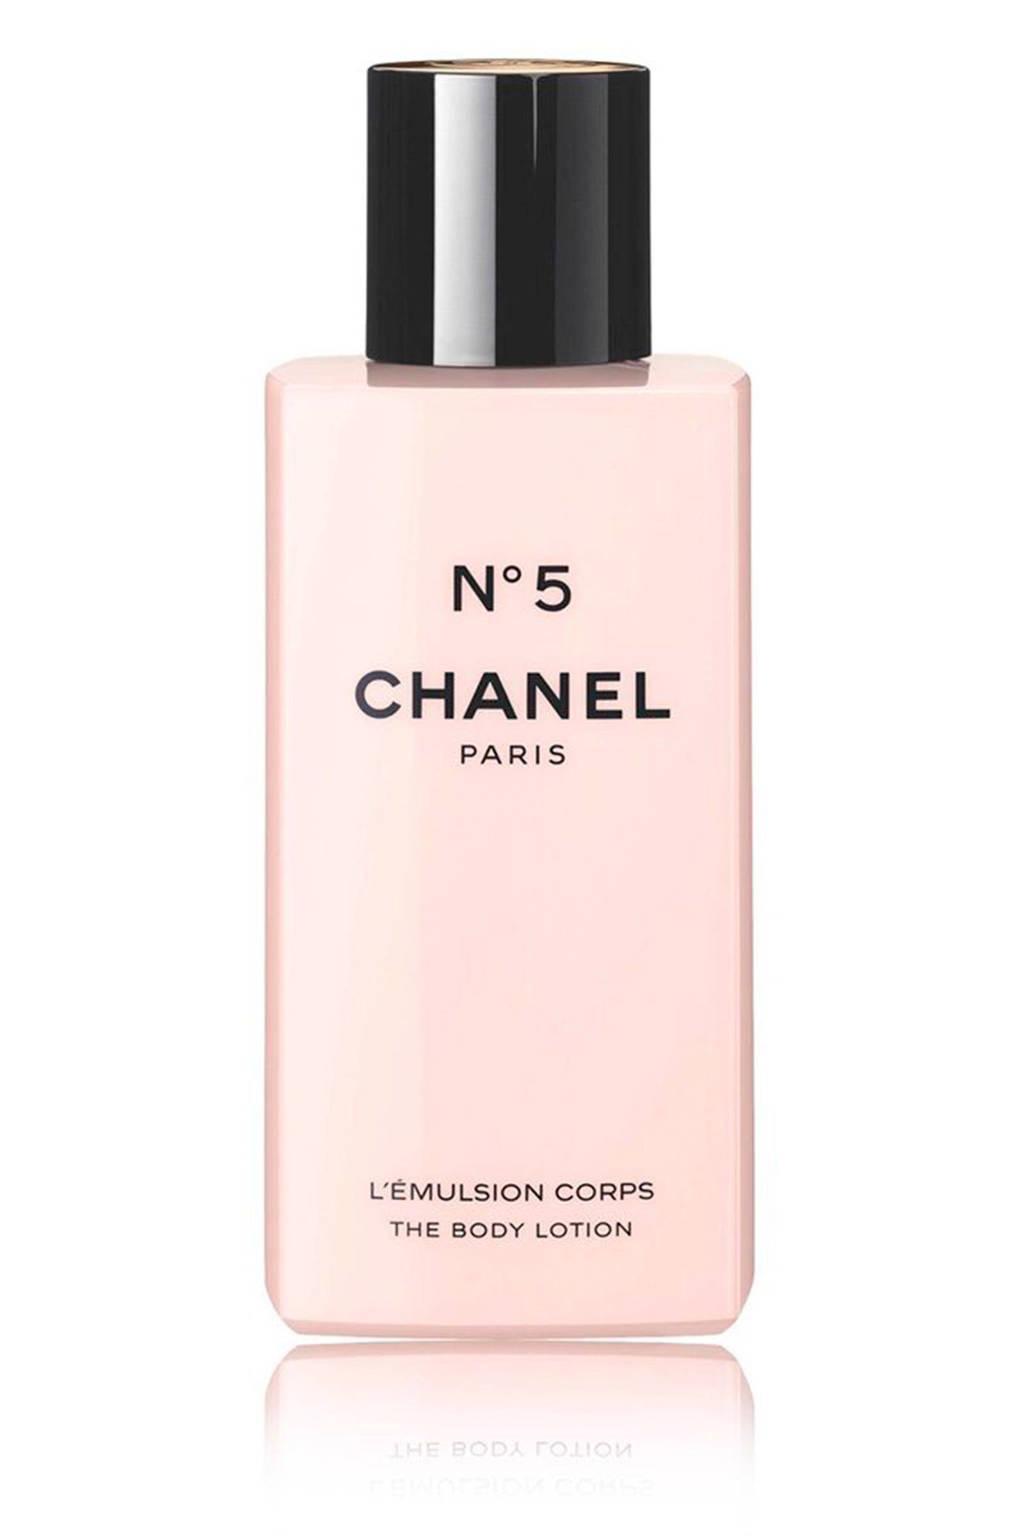 Chanel No. 5 bodylotion - 200 ml